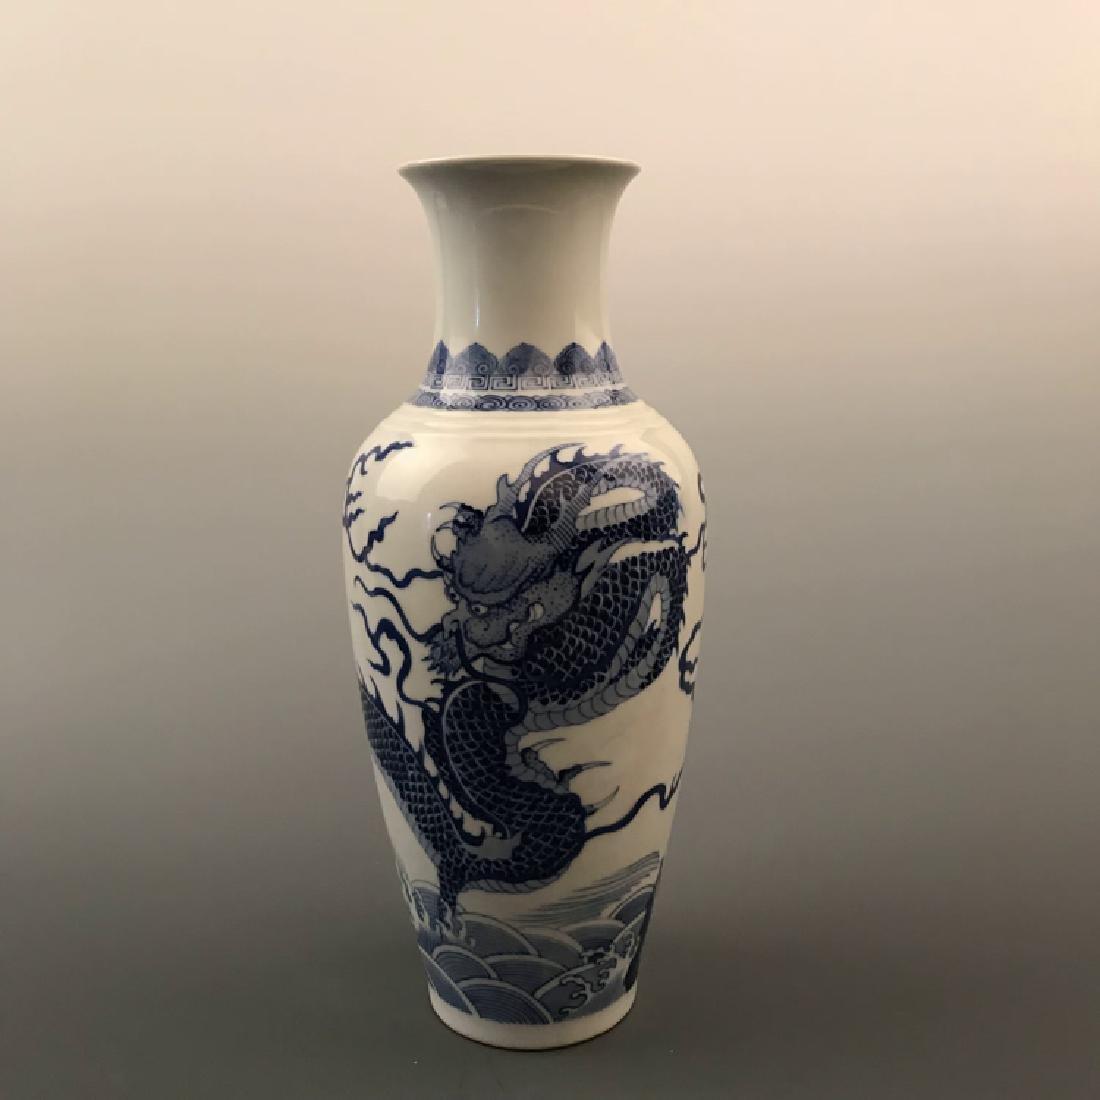 Chinese Blue and white Dragon Vase with Kangxi Mark